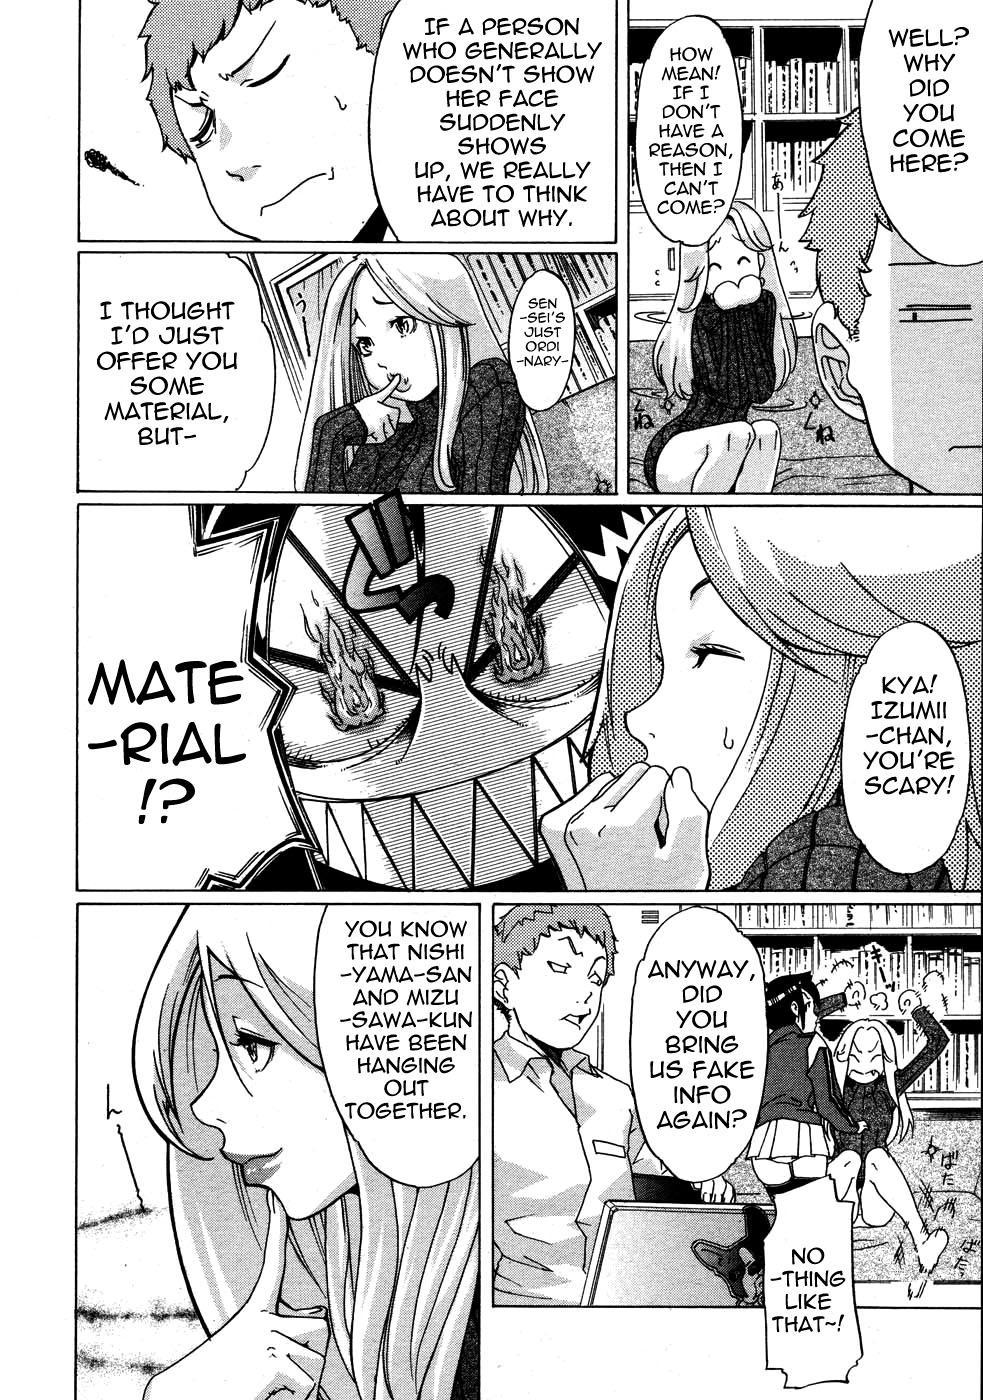 [Royal Koyanagi] Milky Shot! (School Is Crazy these Days) Ch.1-2 [English] 13